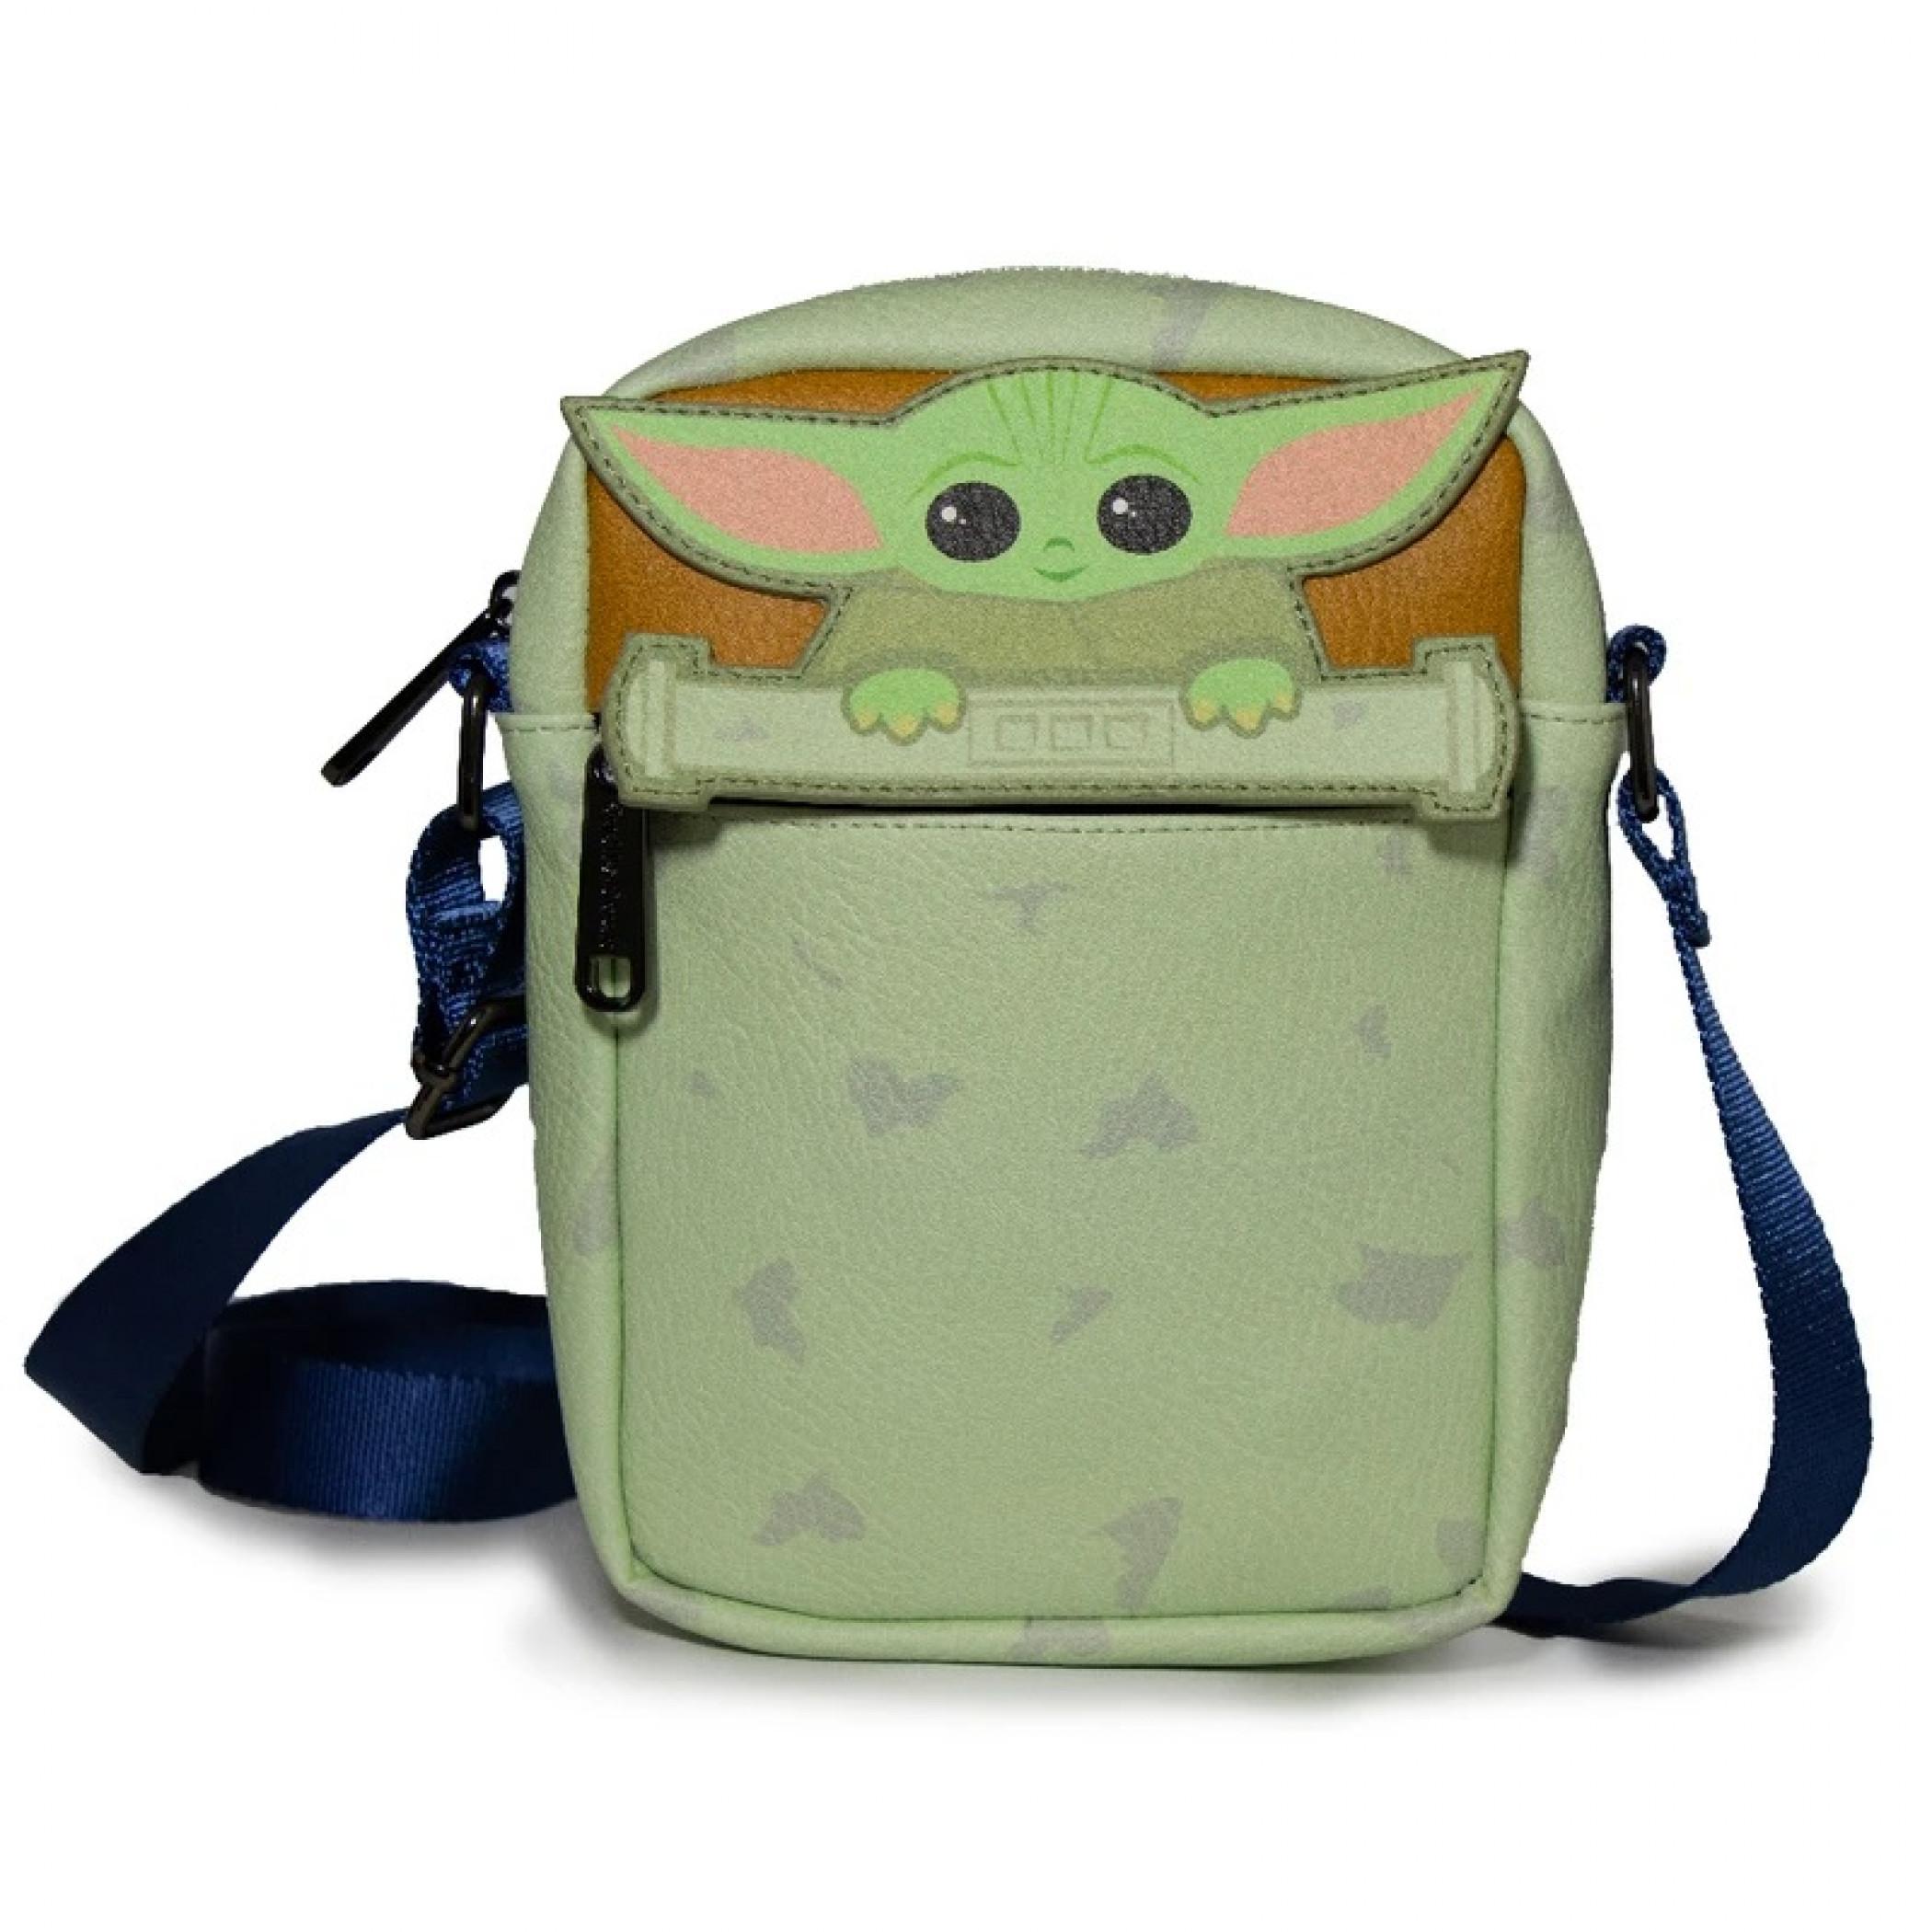 The Mandalorian The Child Peeking Crossbody Vegan Leather Bag